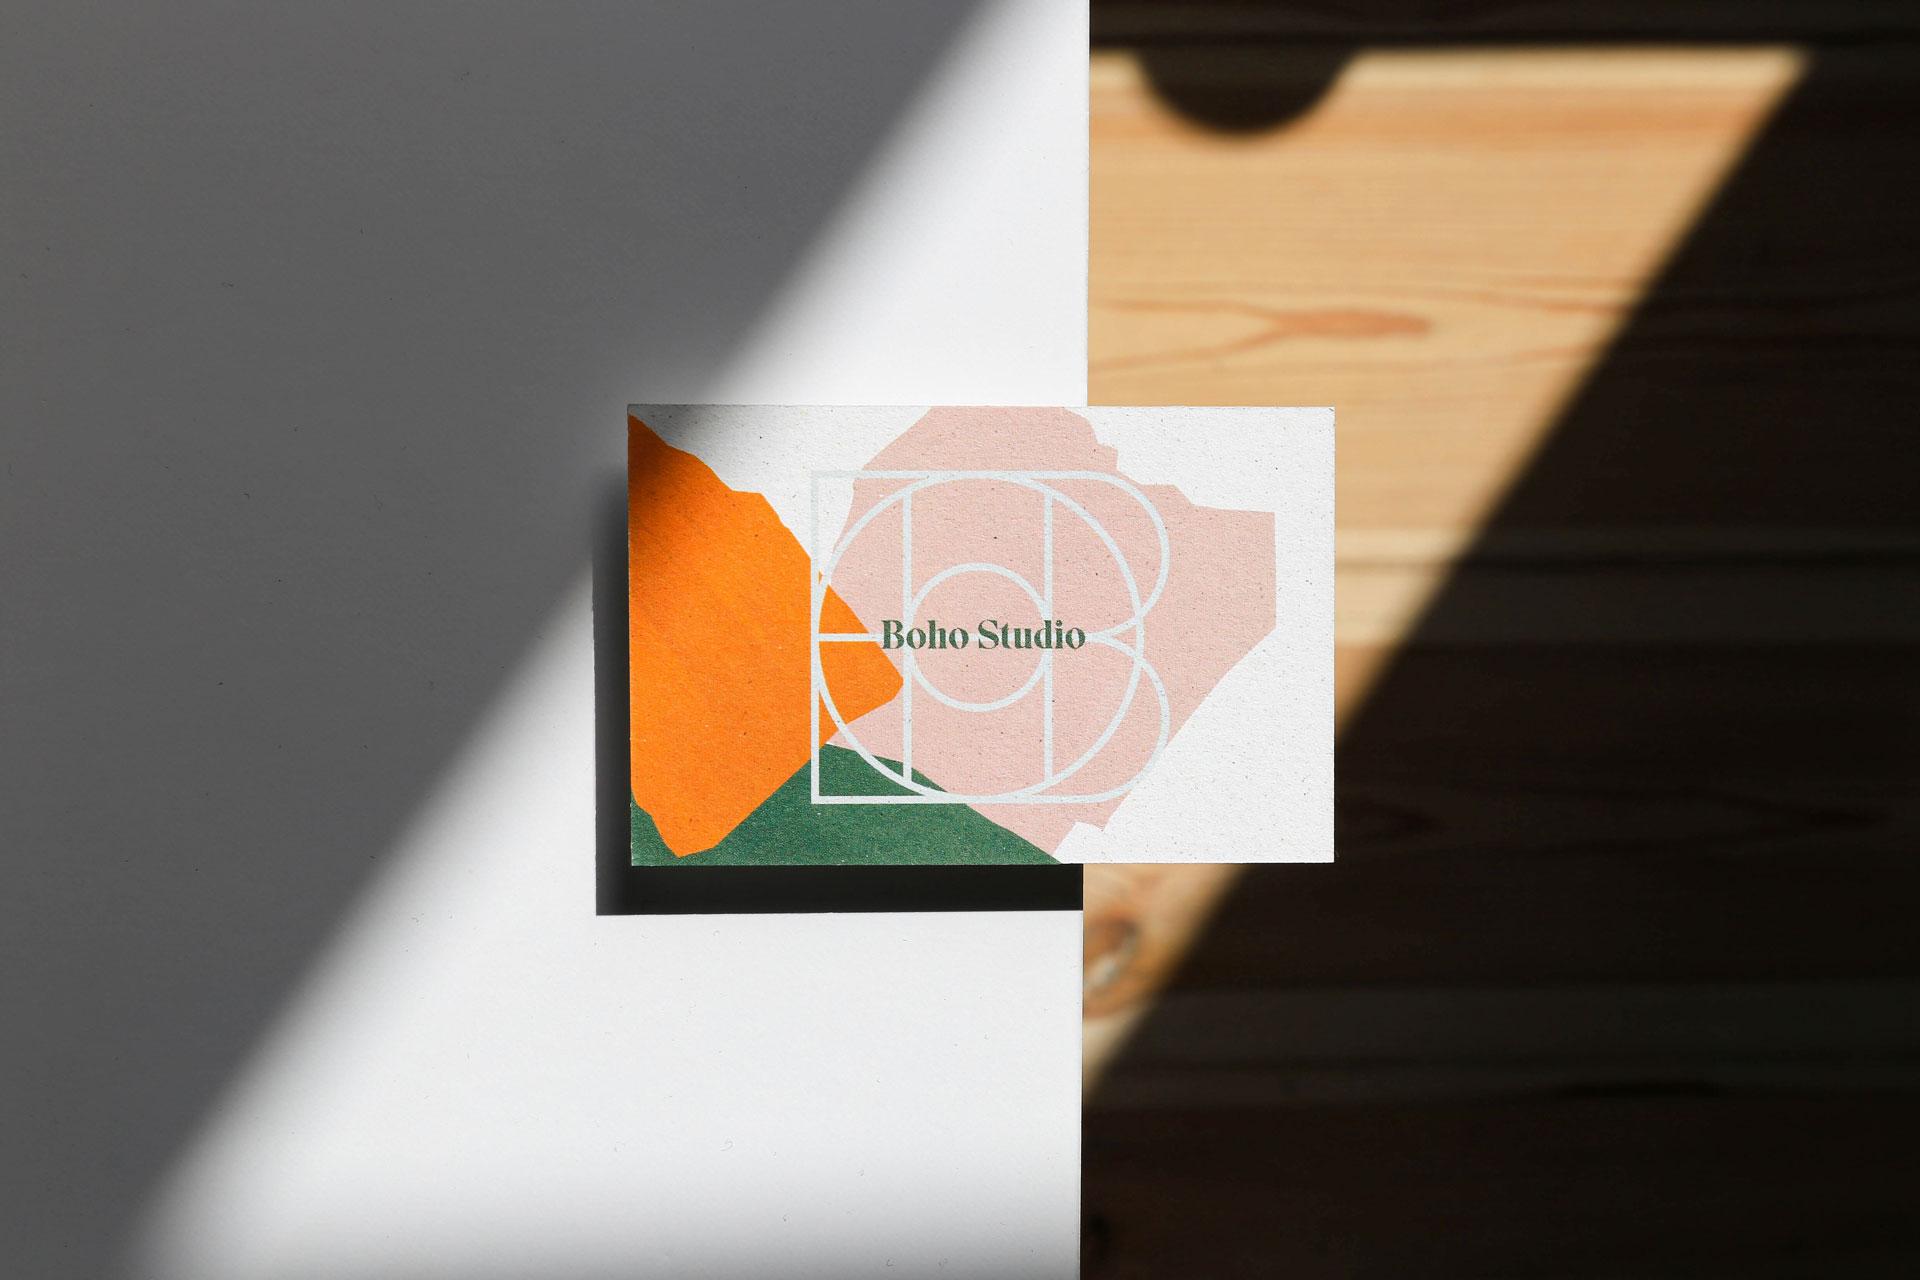 Business Card - Boho Studio by Uniforma